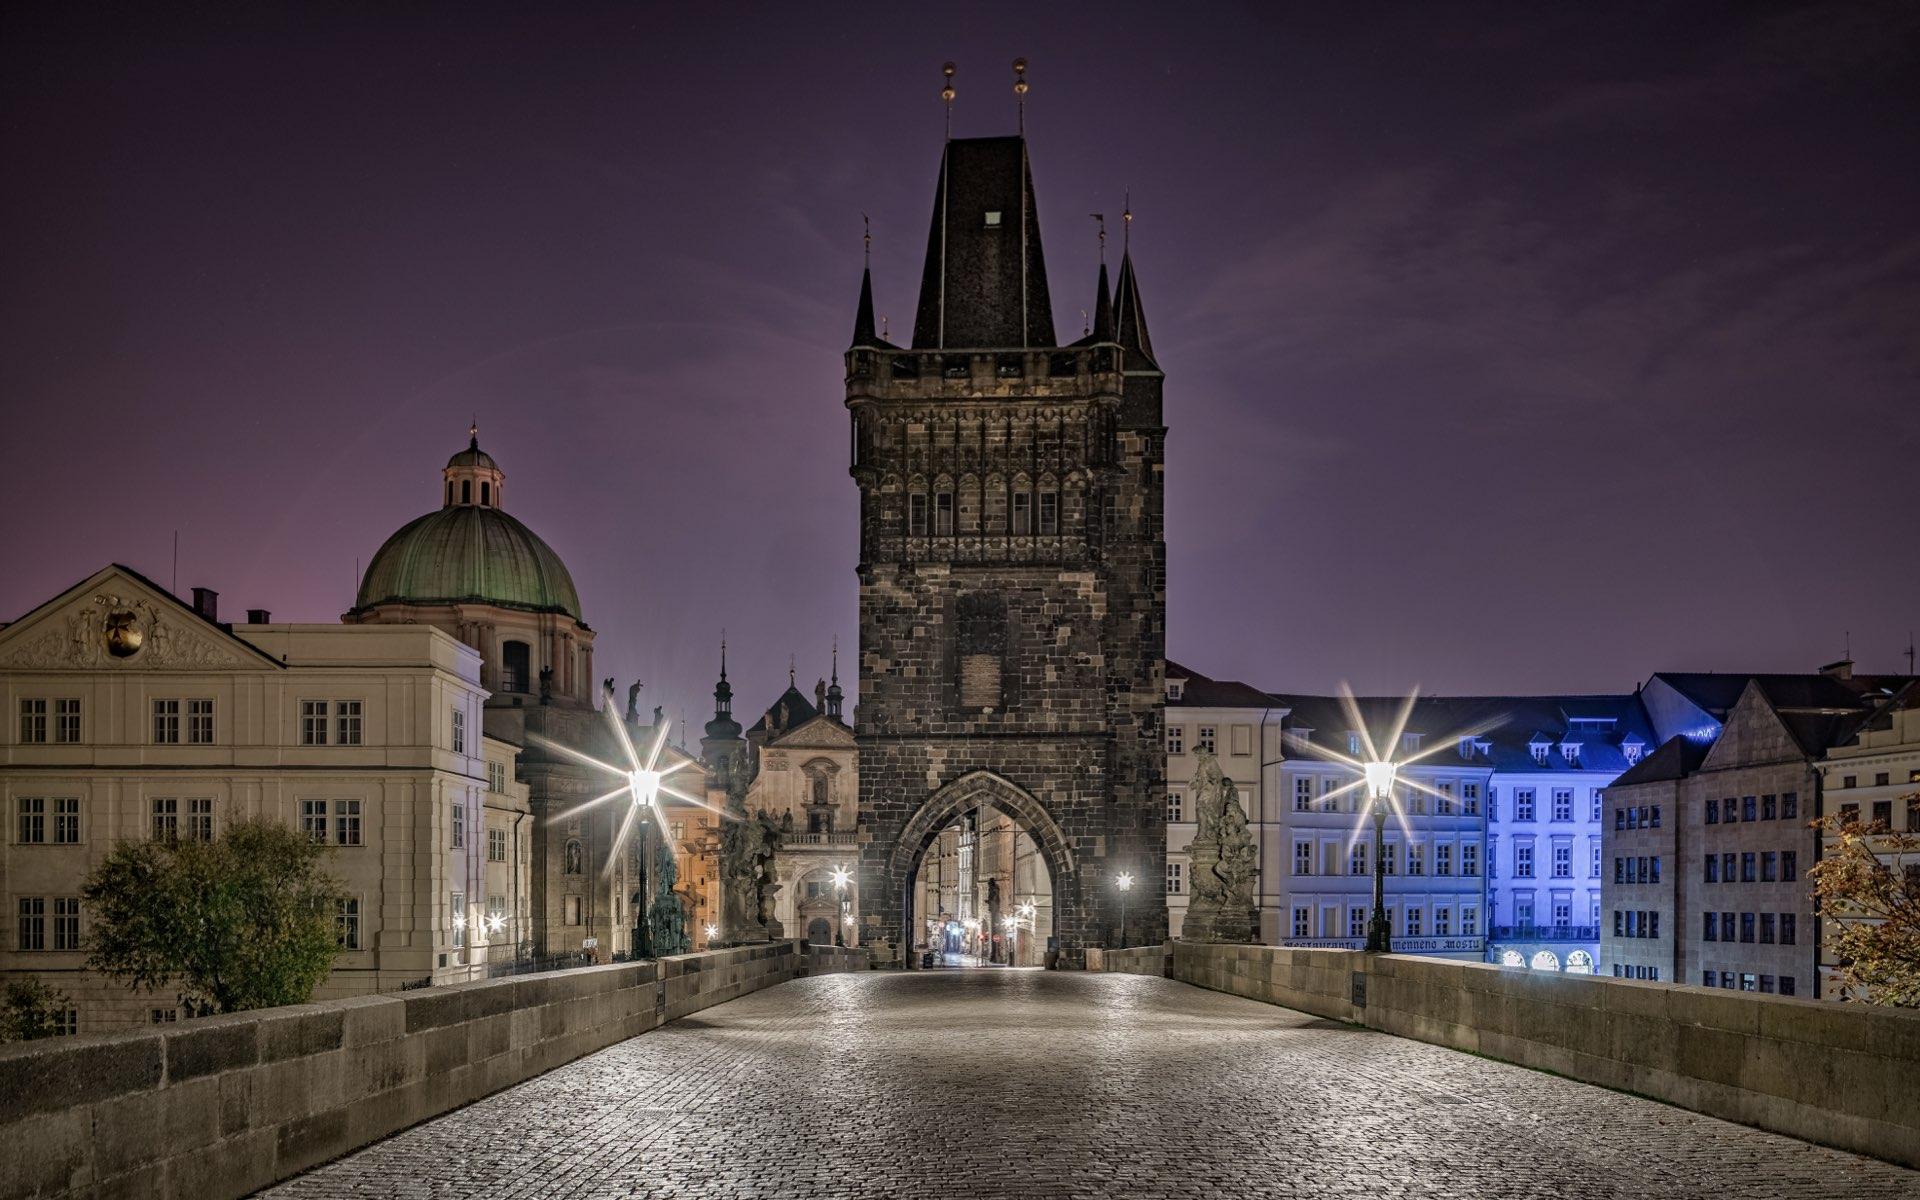 Lions Gate Camera Club Prague 2.001.jpeg